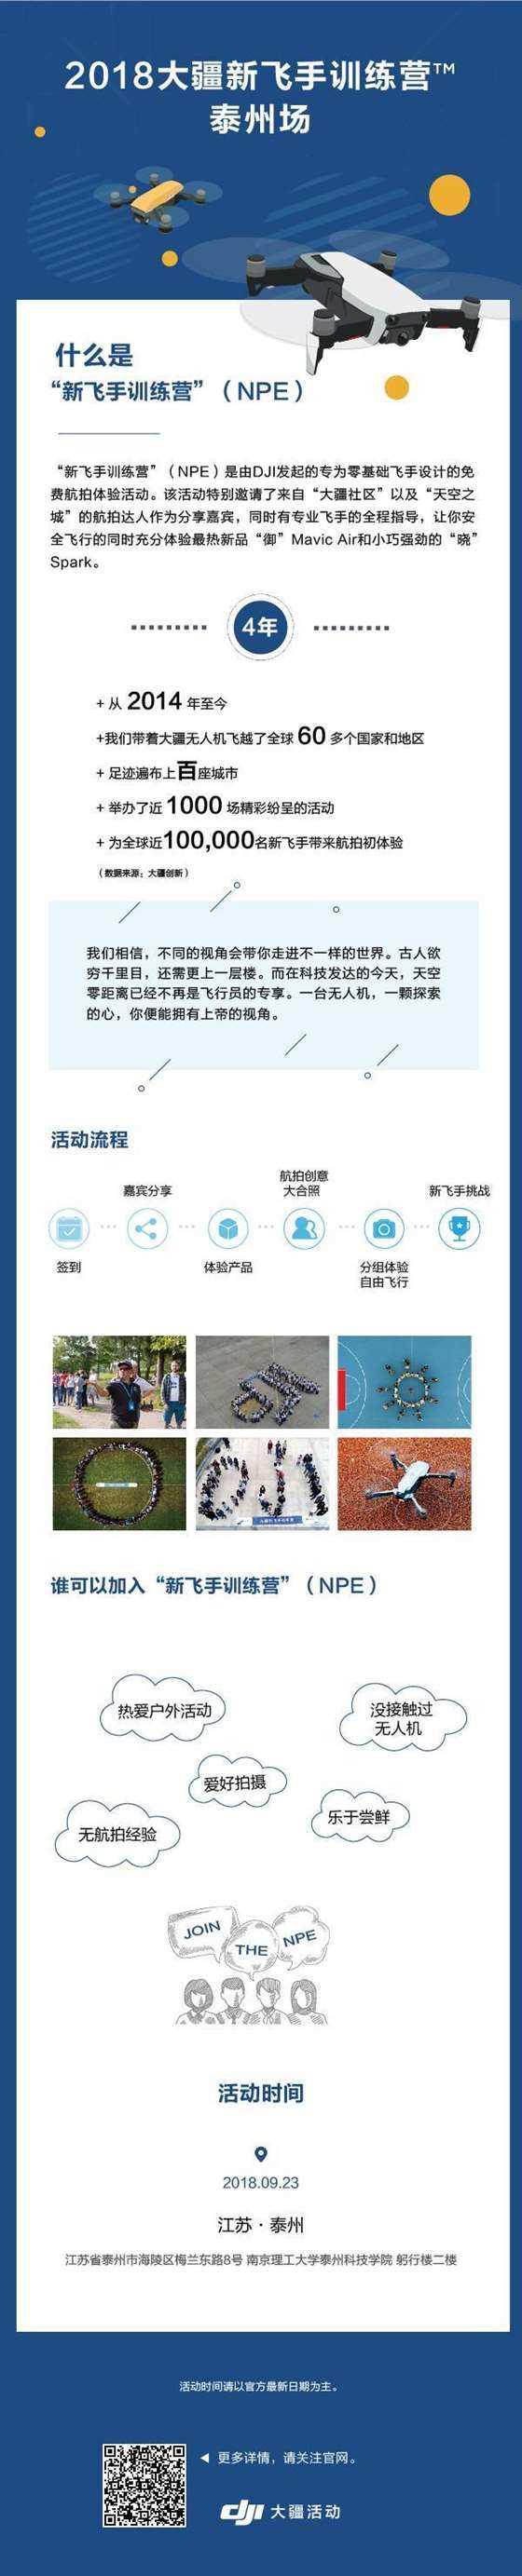 NPE活动宣传页_泰州场_20180904.jpg